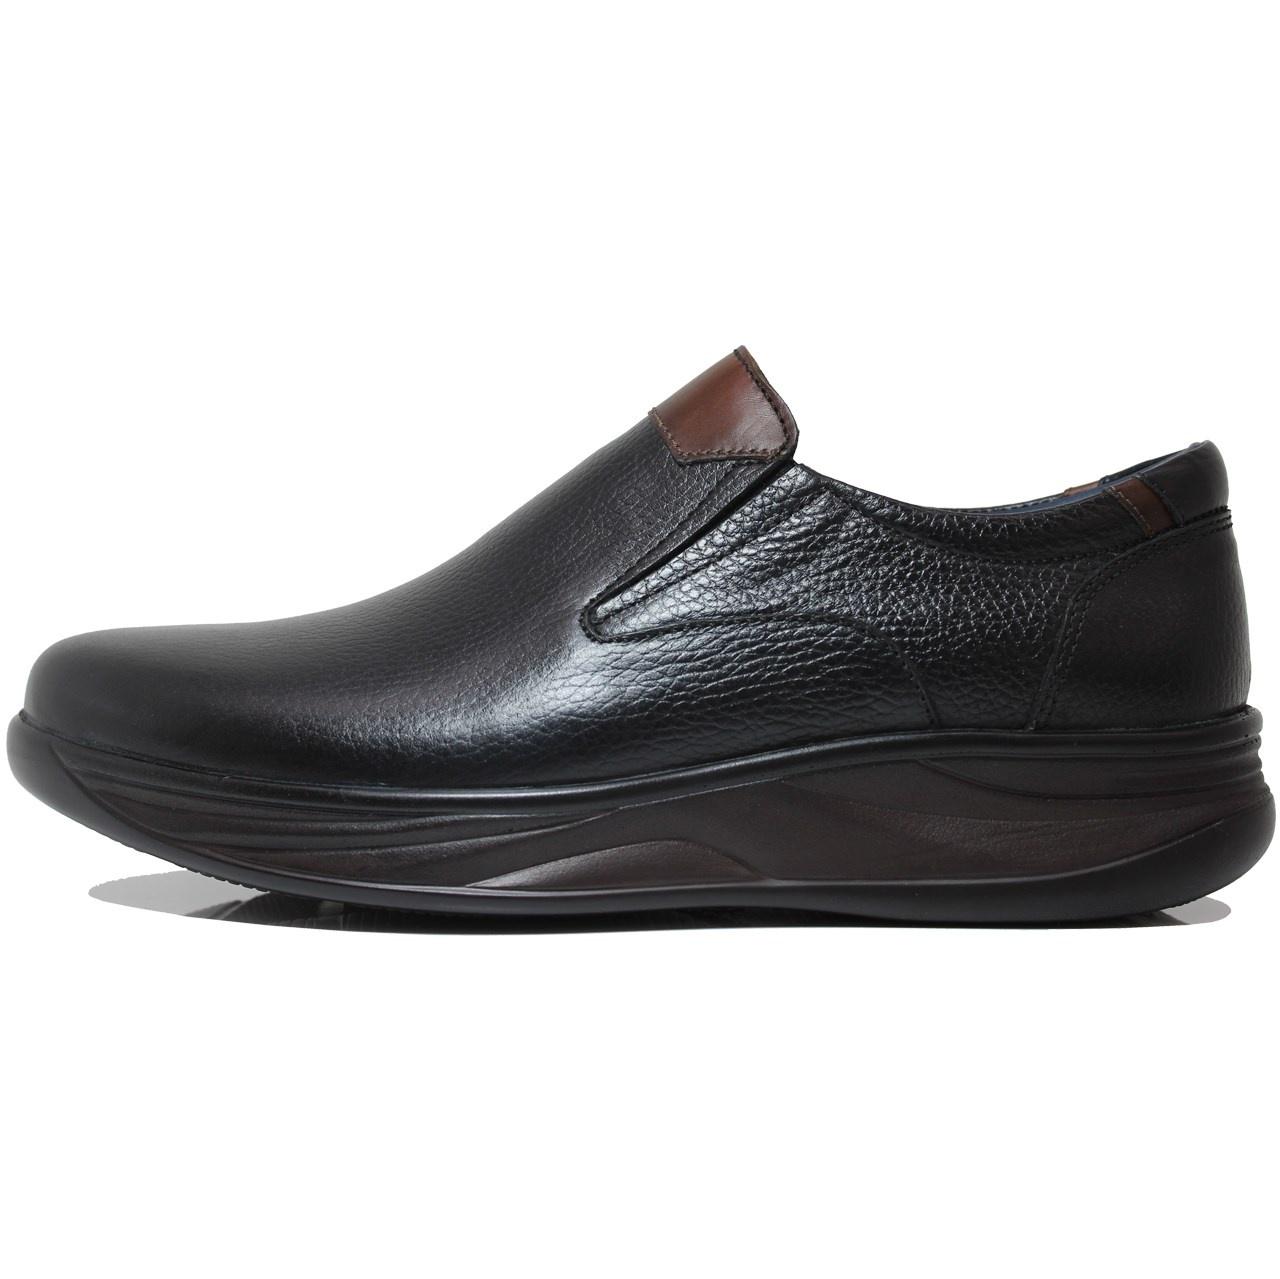 کفش مردانه چرم طبیعی ژست مدل 2041